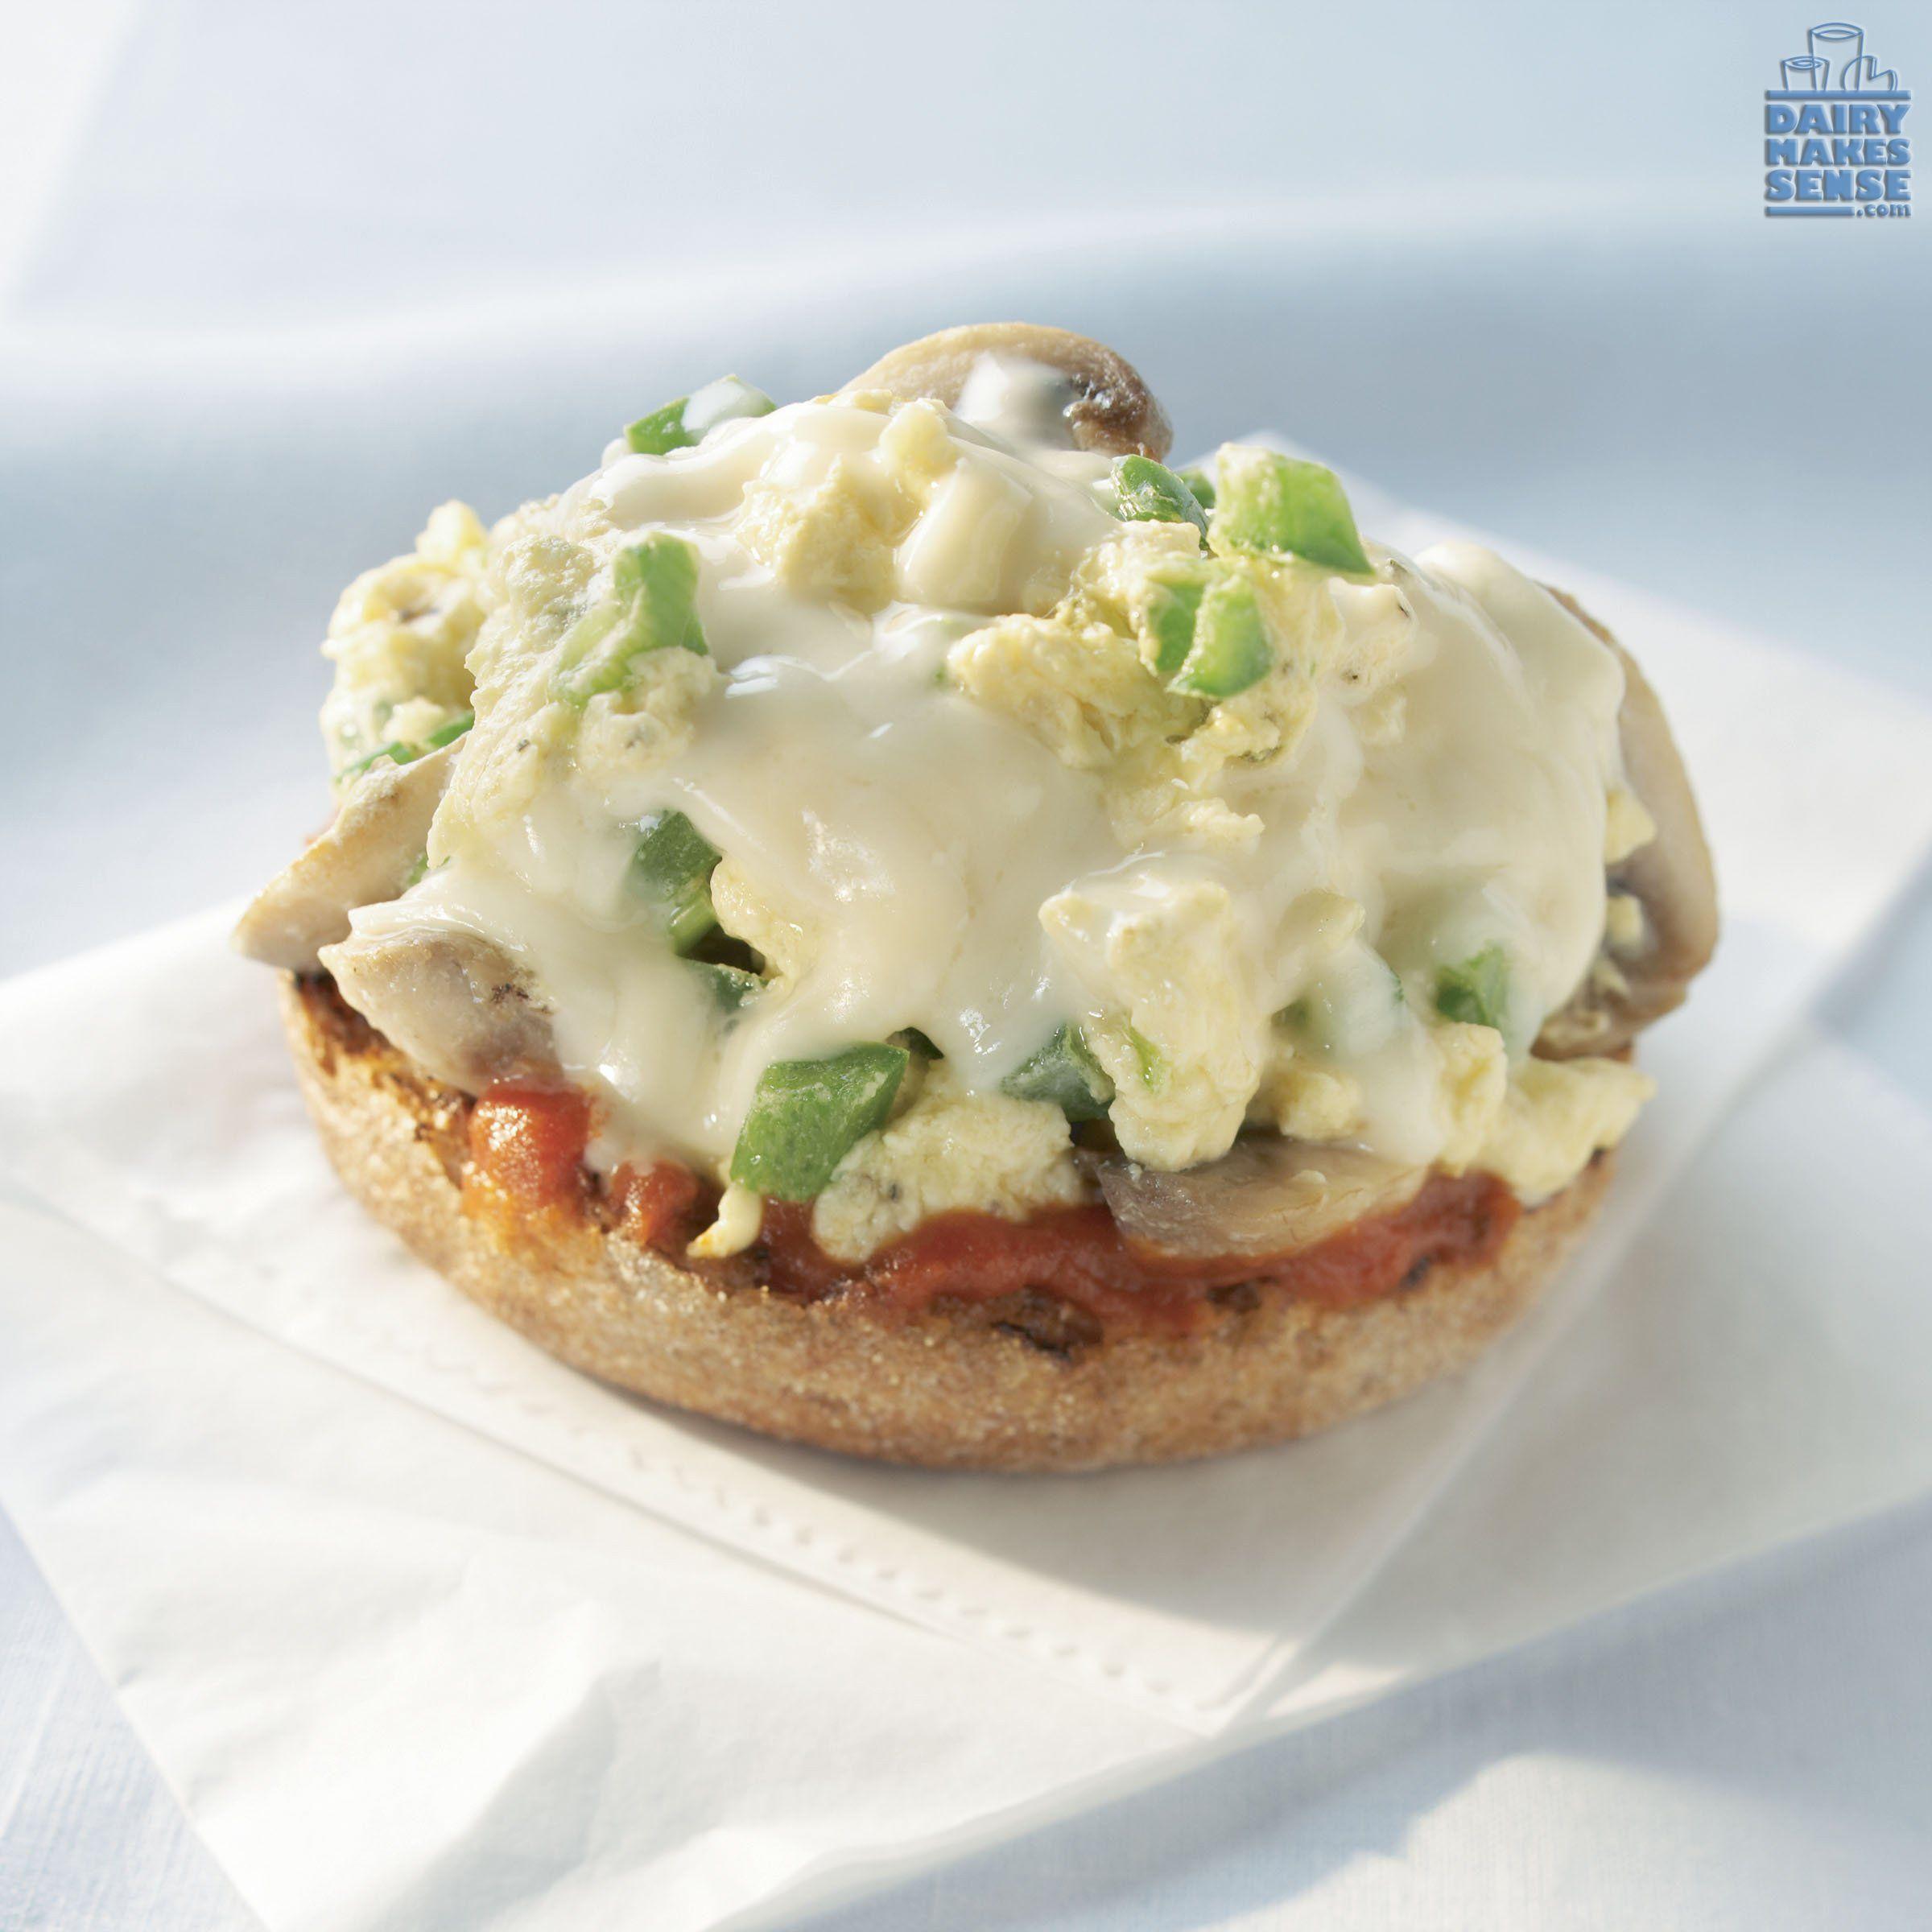 #wwwnutritiontwinscom #newsletter #satisfying #mozzarella #breakfast #delicious #nutrition #calories...